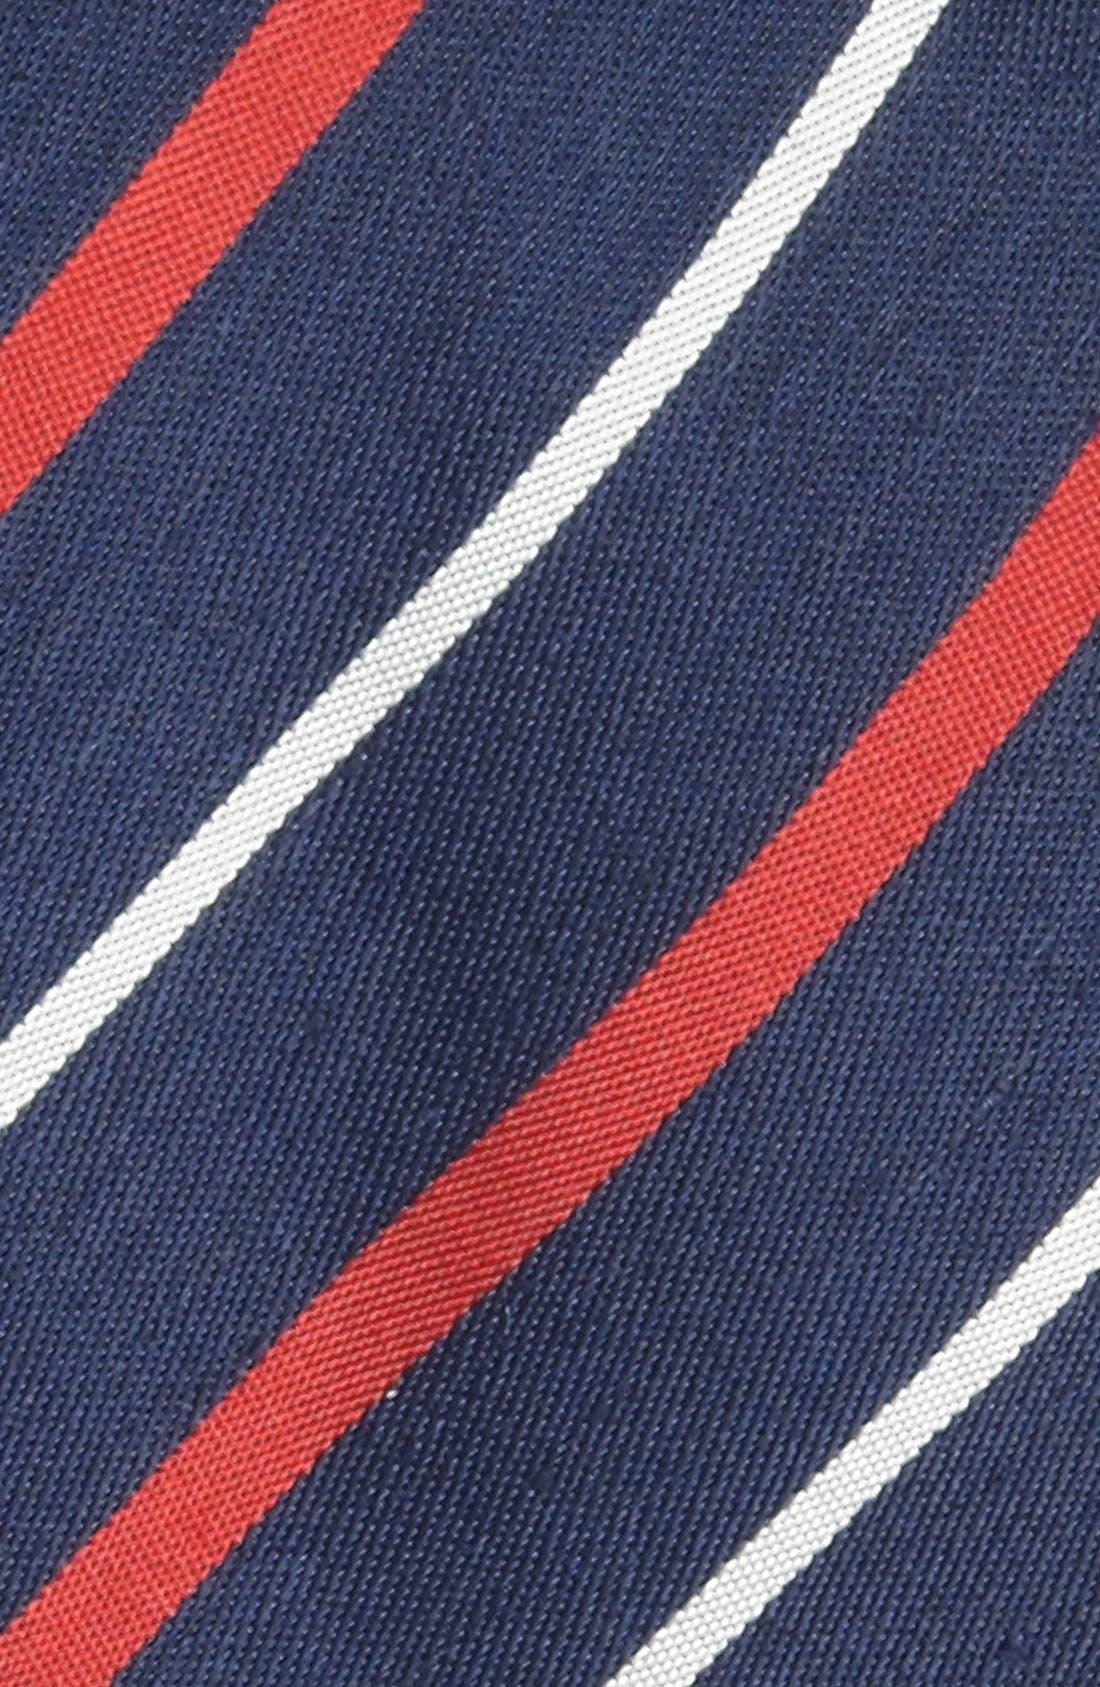 Alternate Image 2  - BOSS HUGO BOSS Woven Linen & Silk Tie